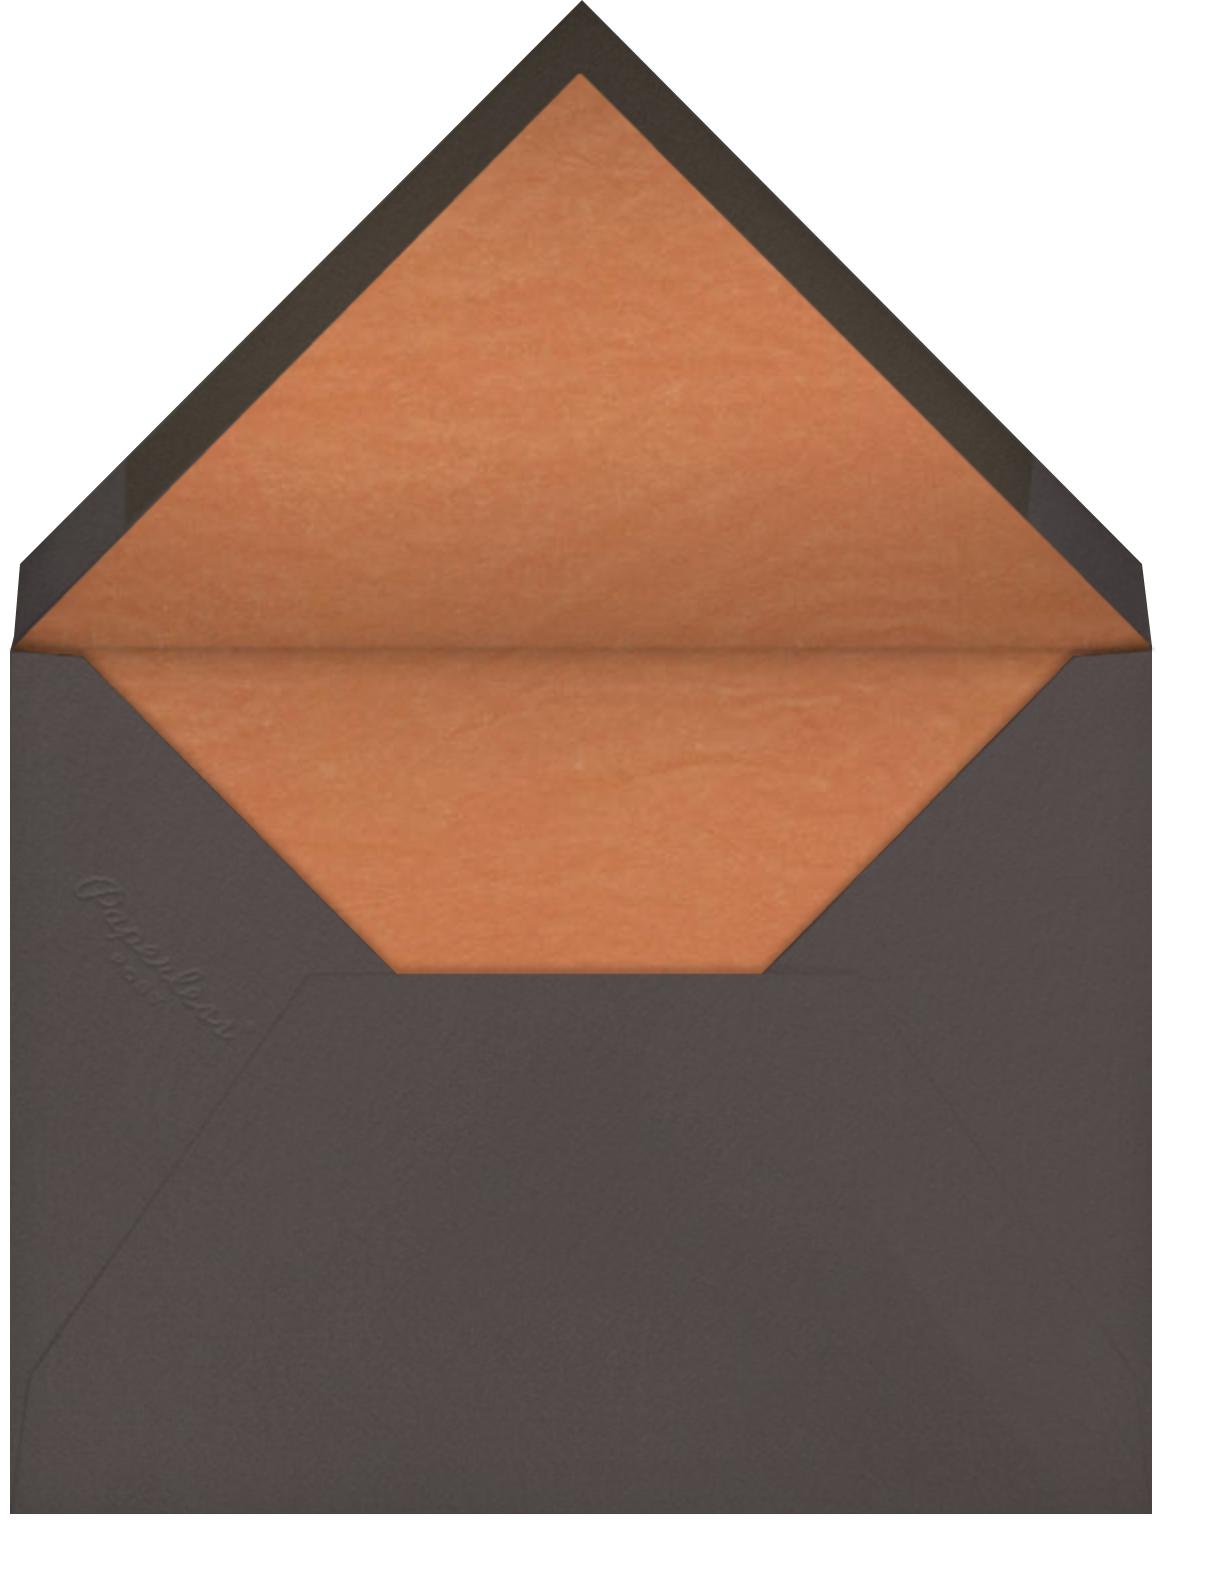 Spirited Affair - Paperless Post - Envelope